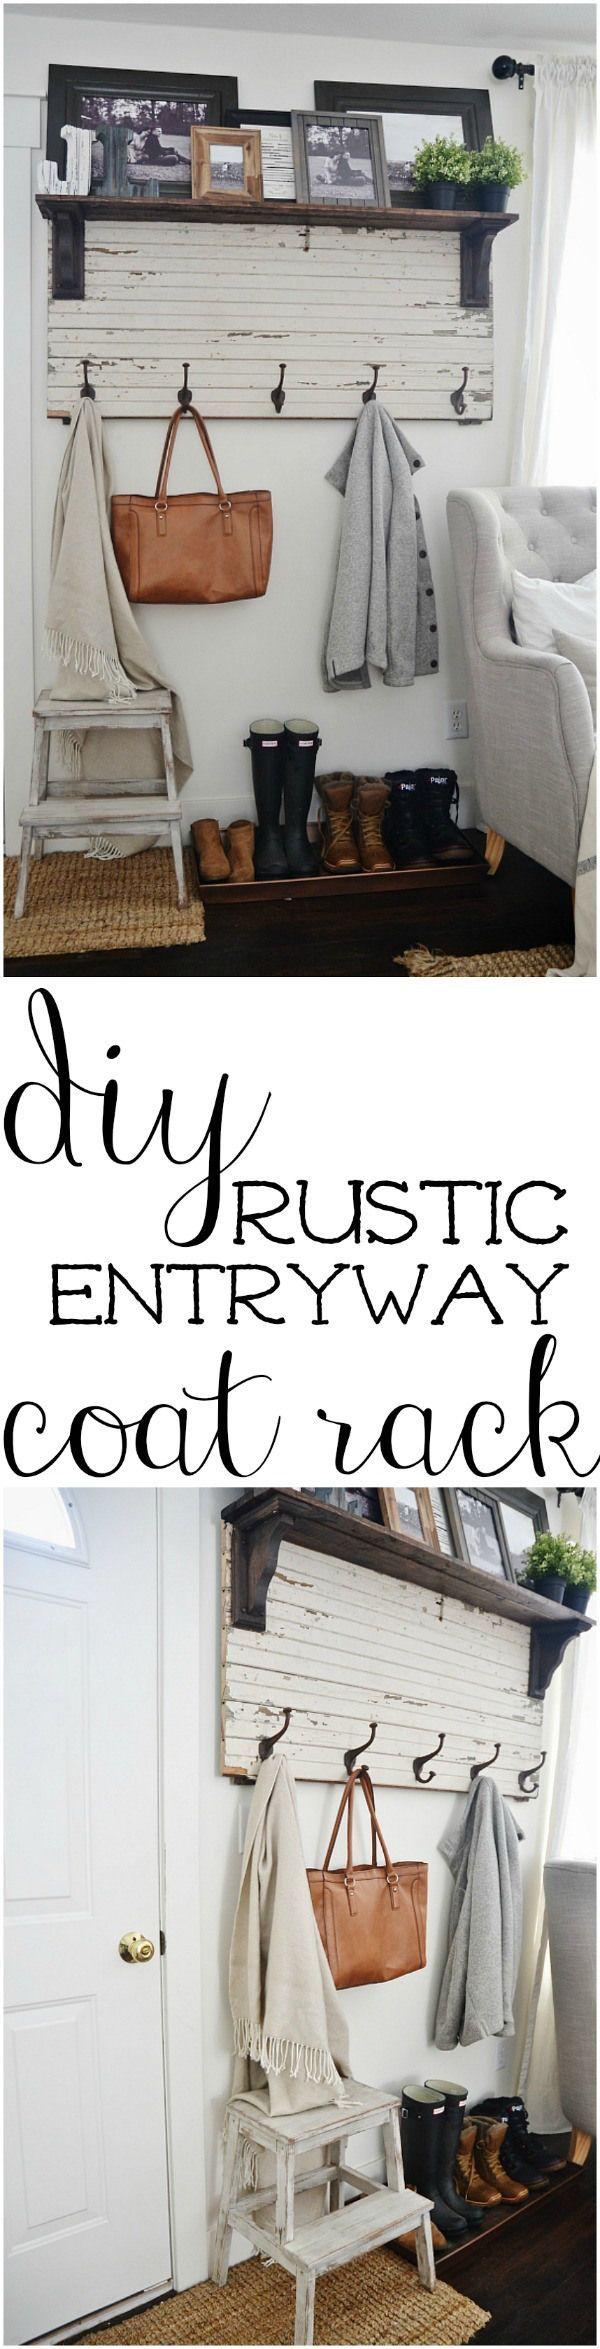 DIY Rustic Entryway Coat Rack, made from a barn door